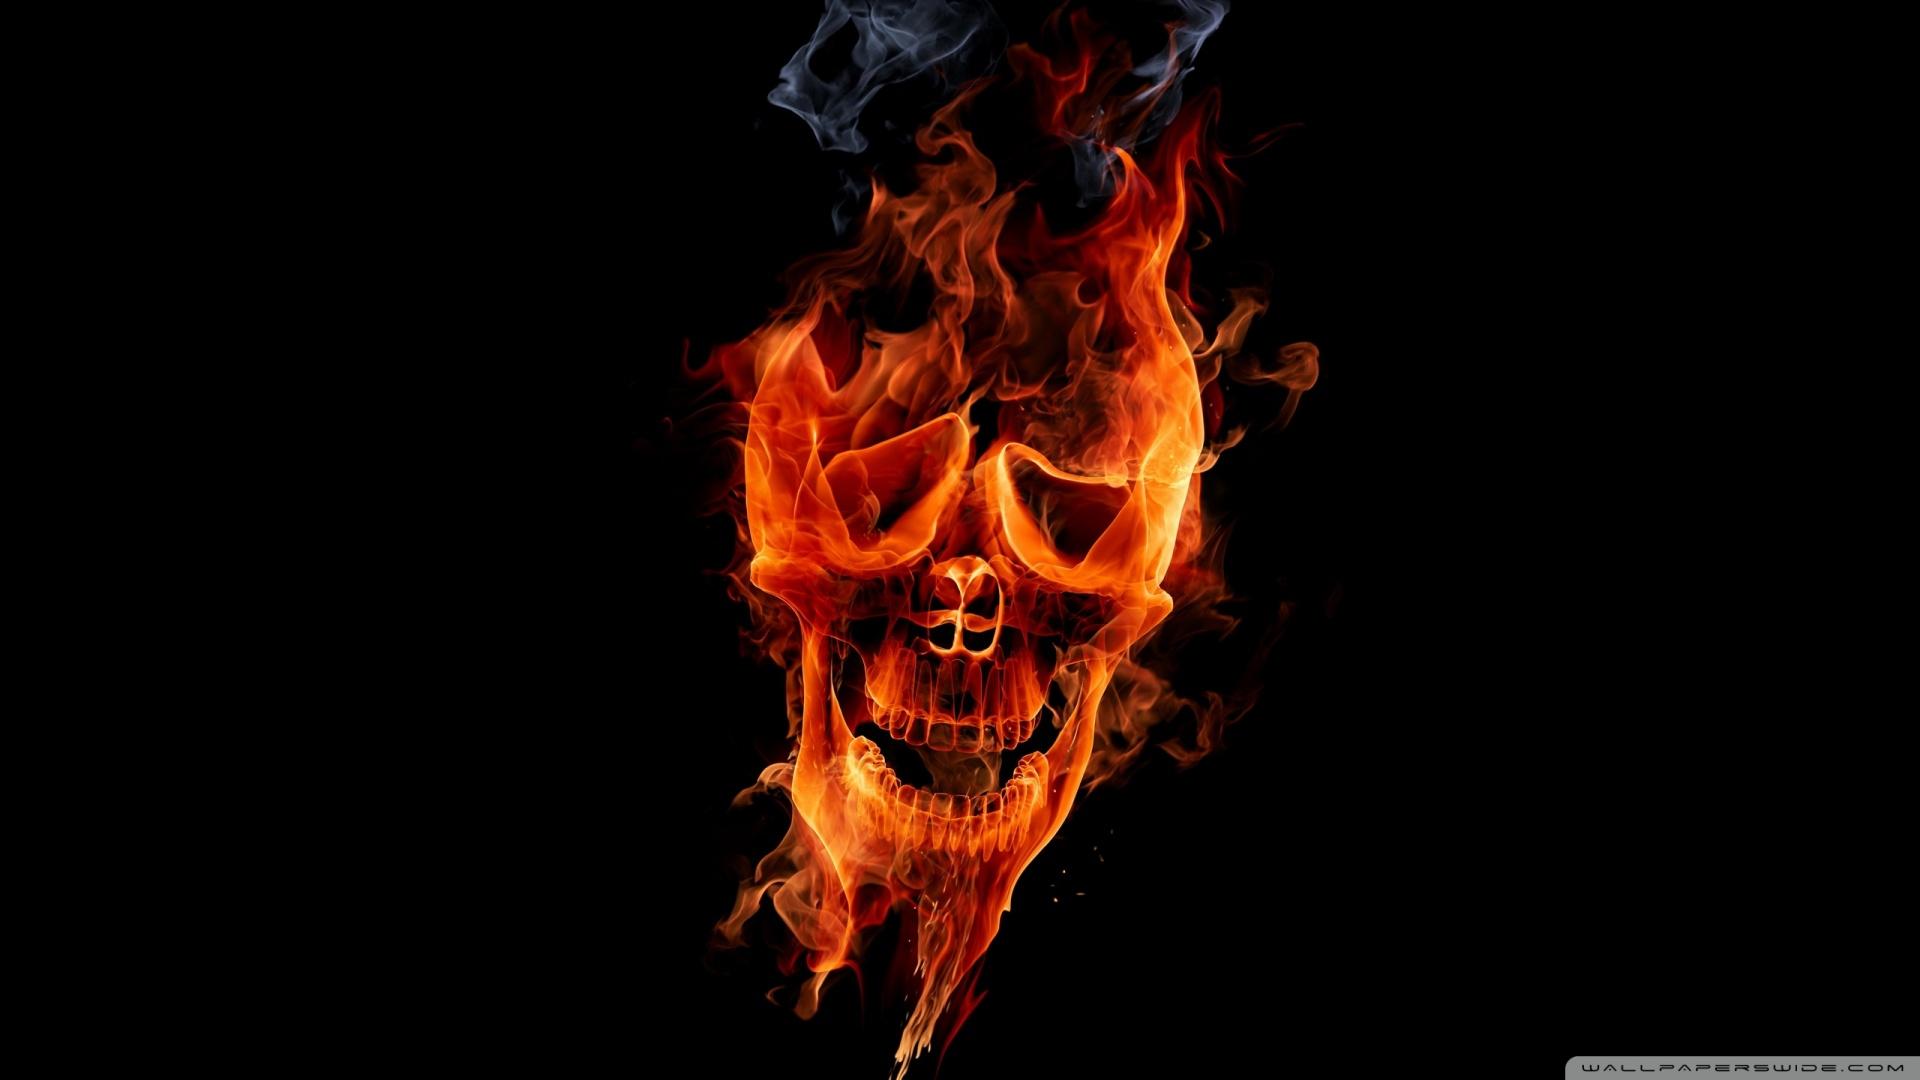 Fire Skull HD desktop wallpaper High Definition 1920x1080